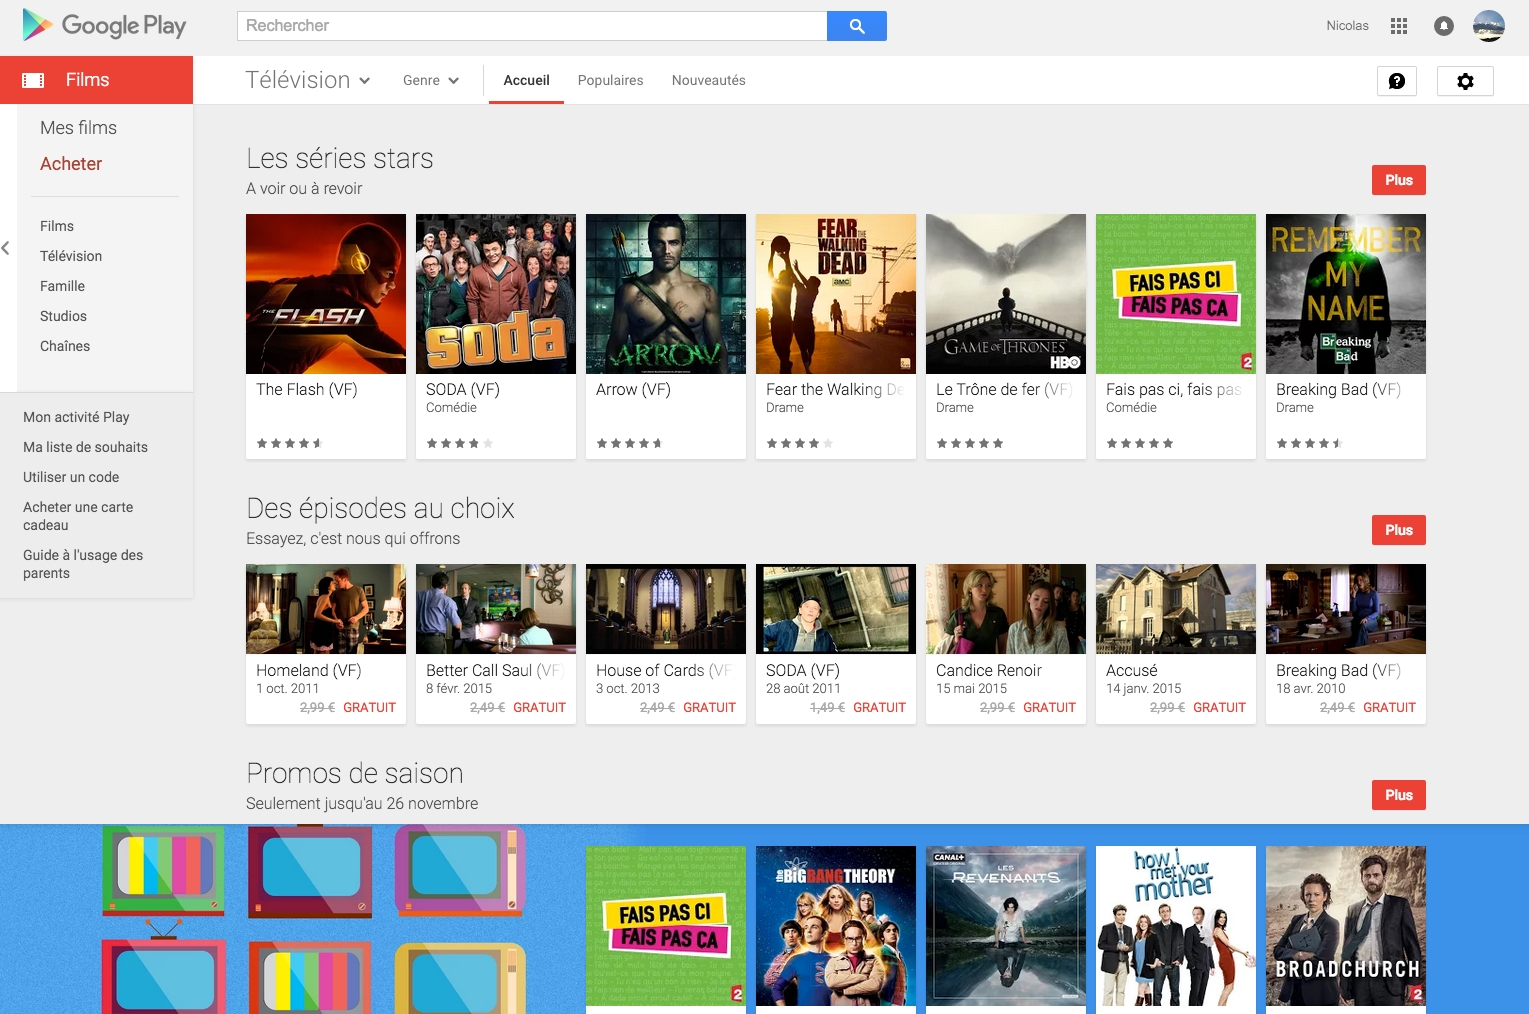 Google Play francais Egedal